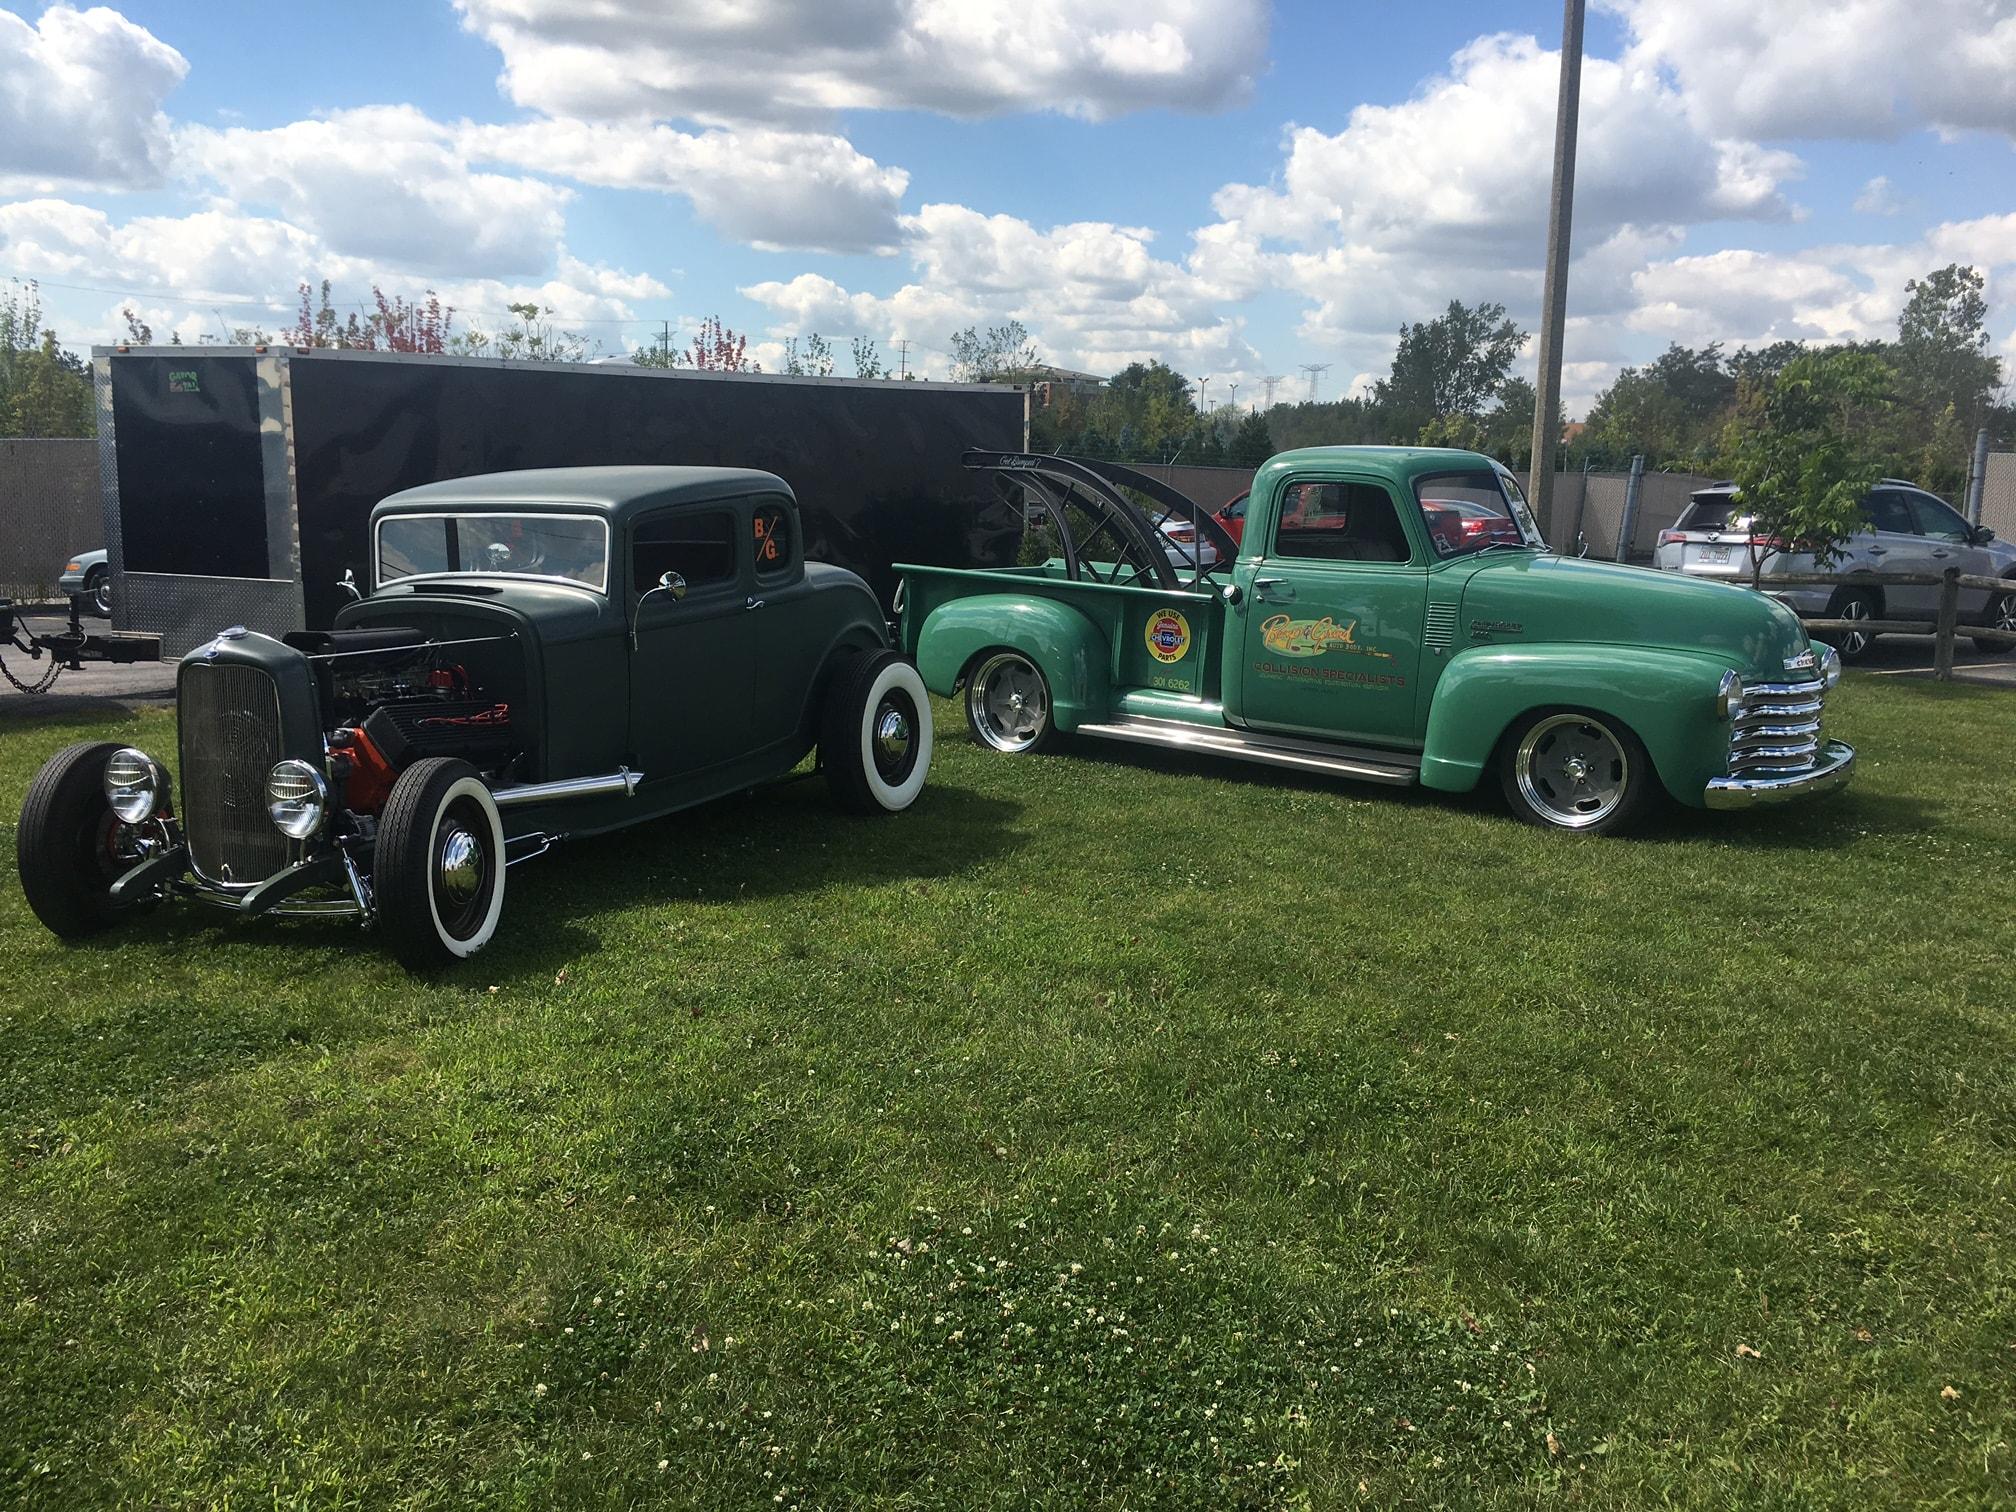 Kevin & Wendy Flondor - Mokena, IL - 1950 Chevrolet 3600